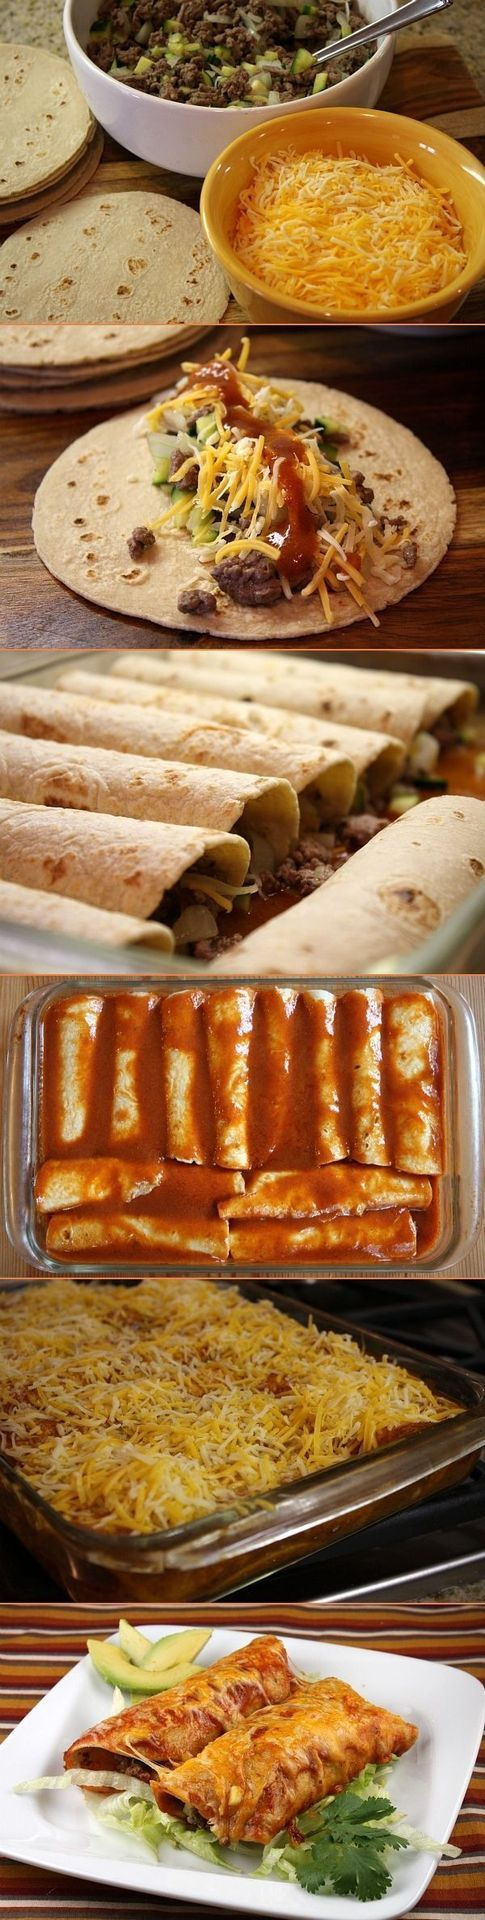 Easy Beef Enchiladas | food | Pinterest